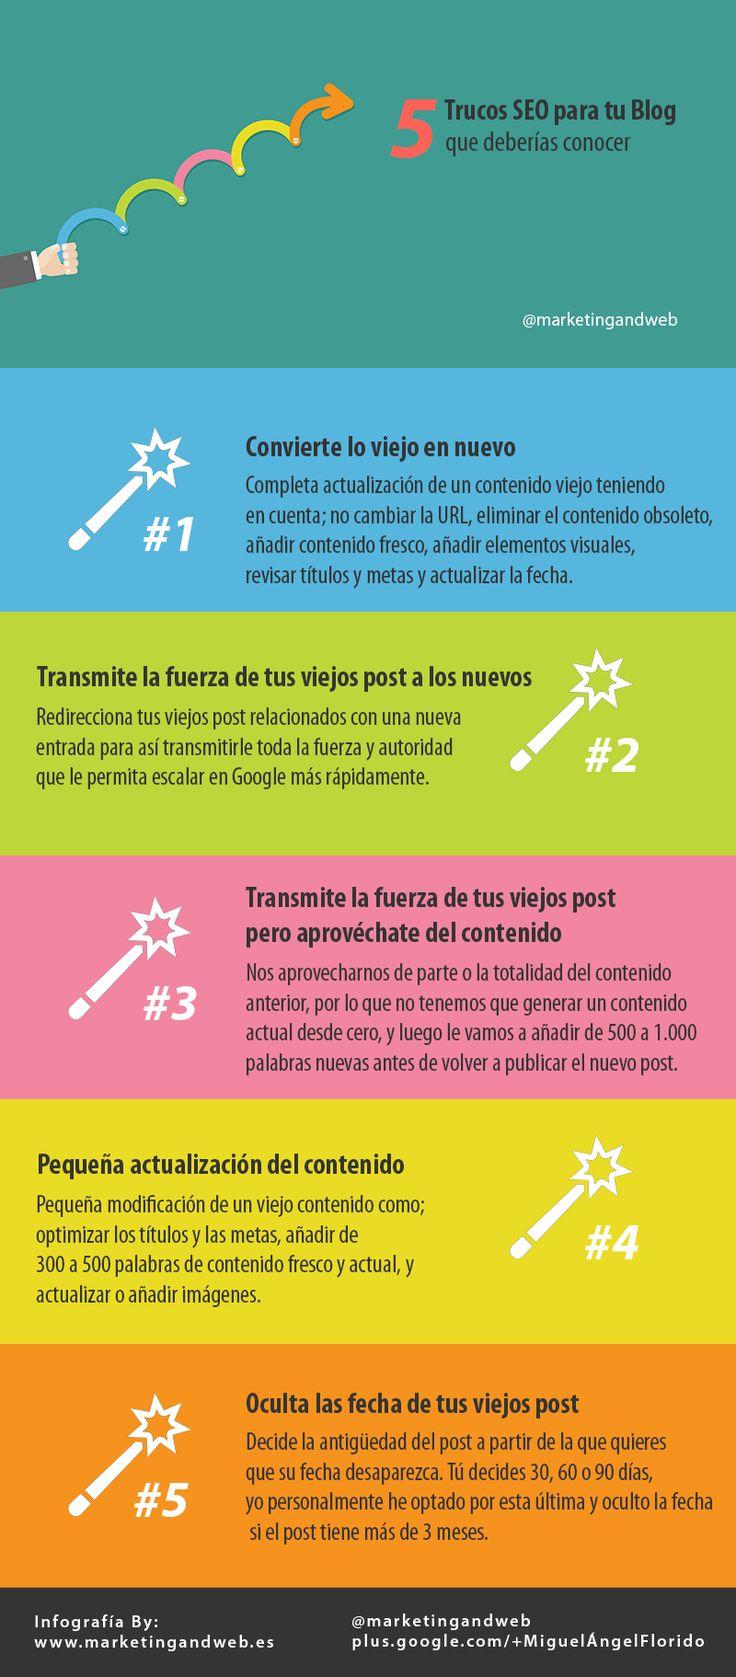 5 trucos seo para tu #blog #infografia http://rubendelaosa.com/ @rubendelaosa